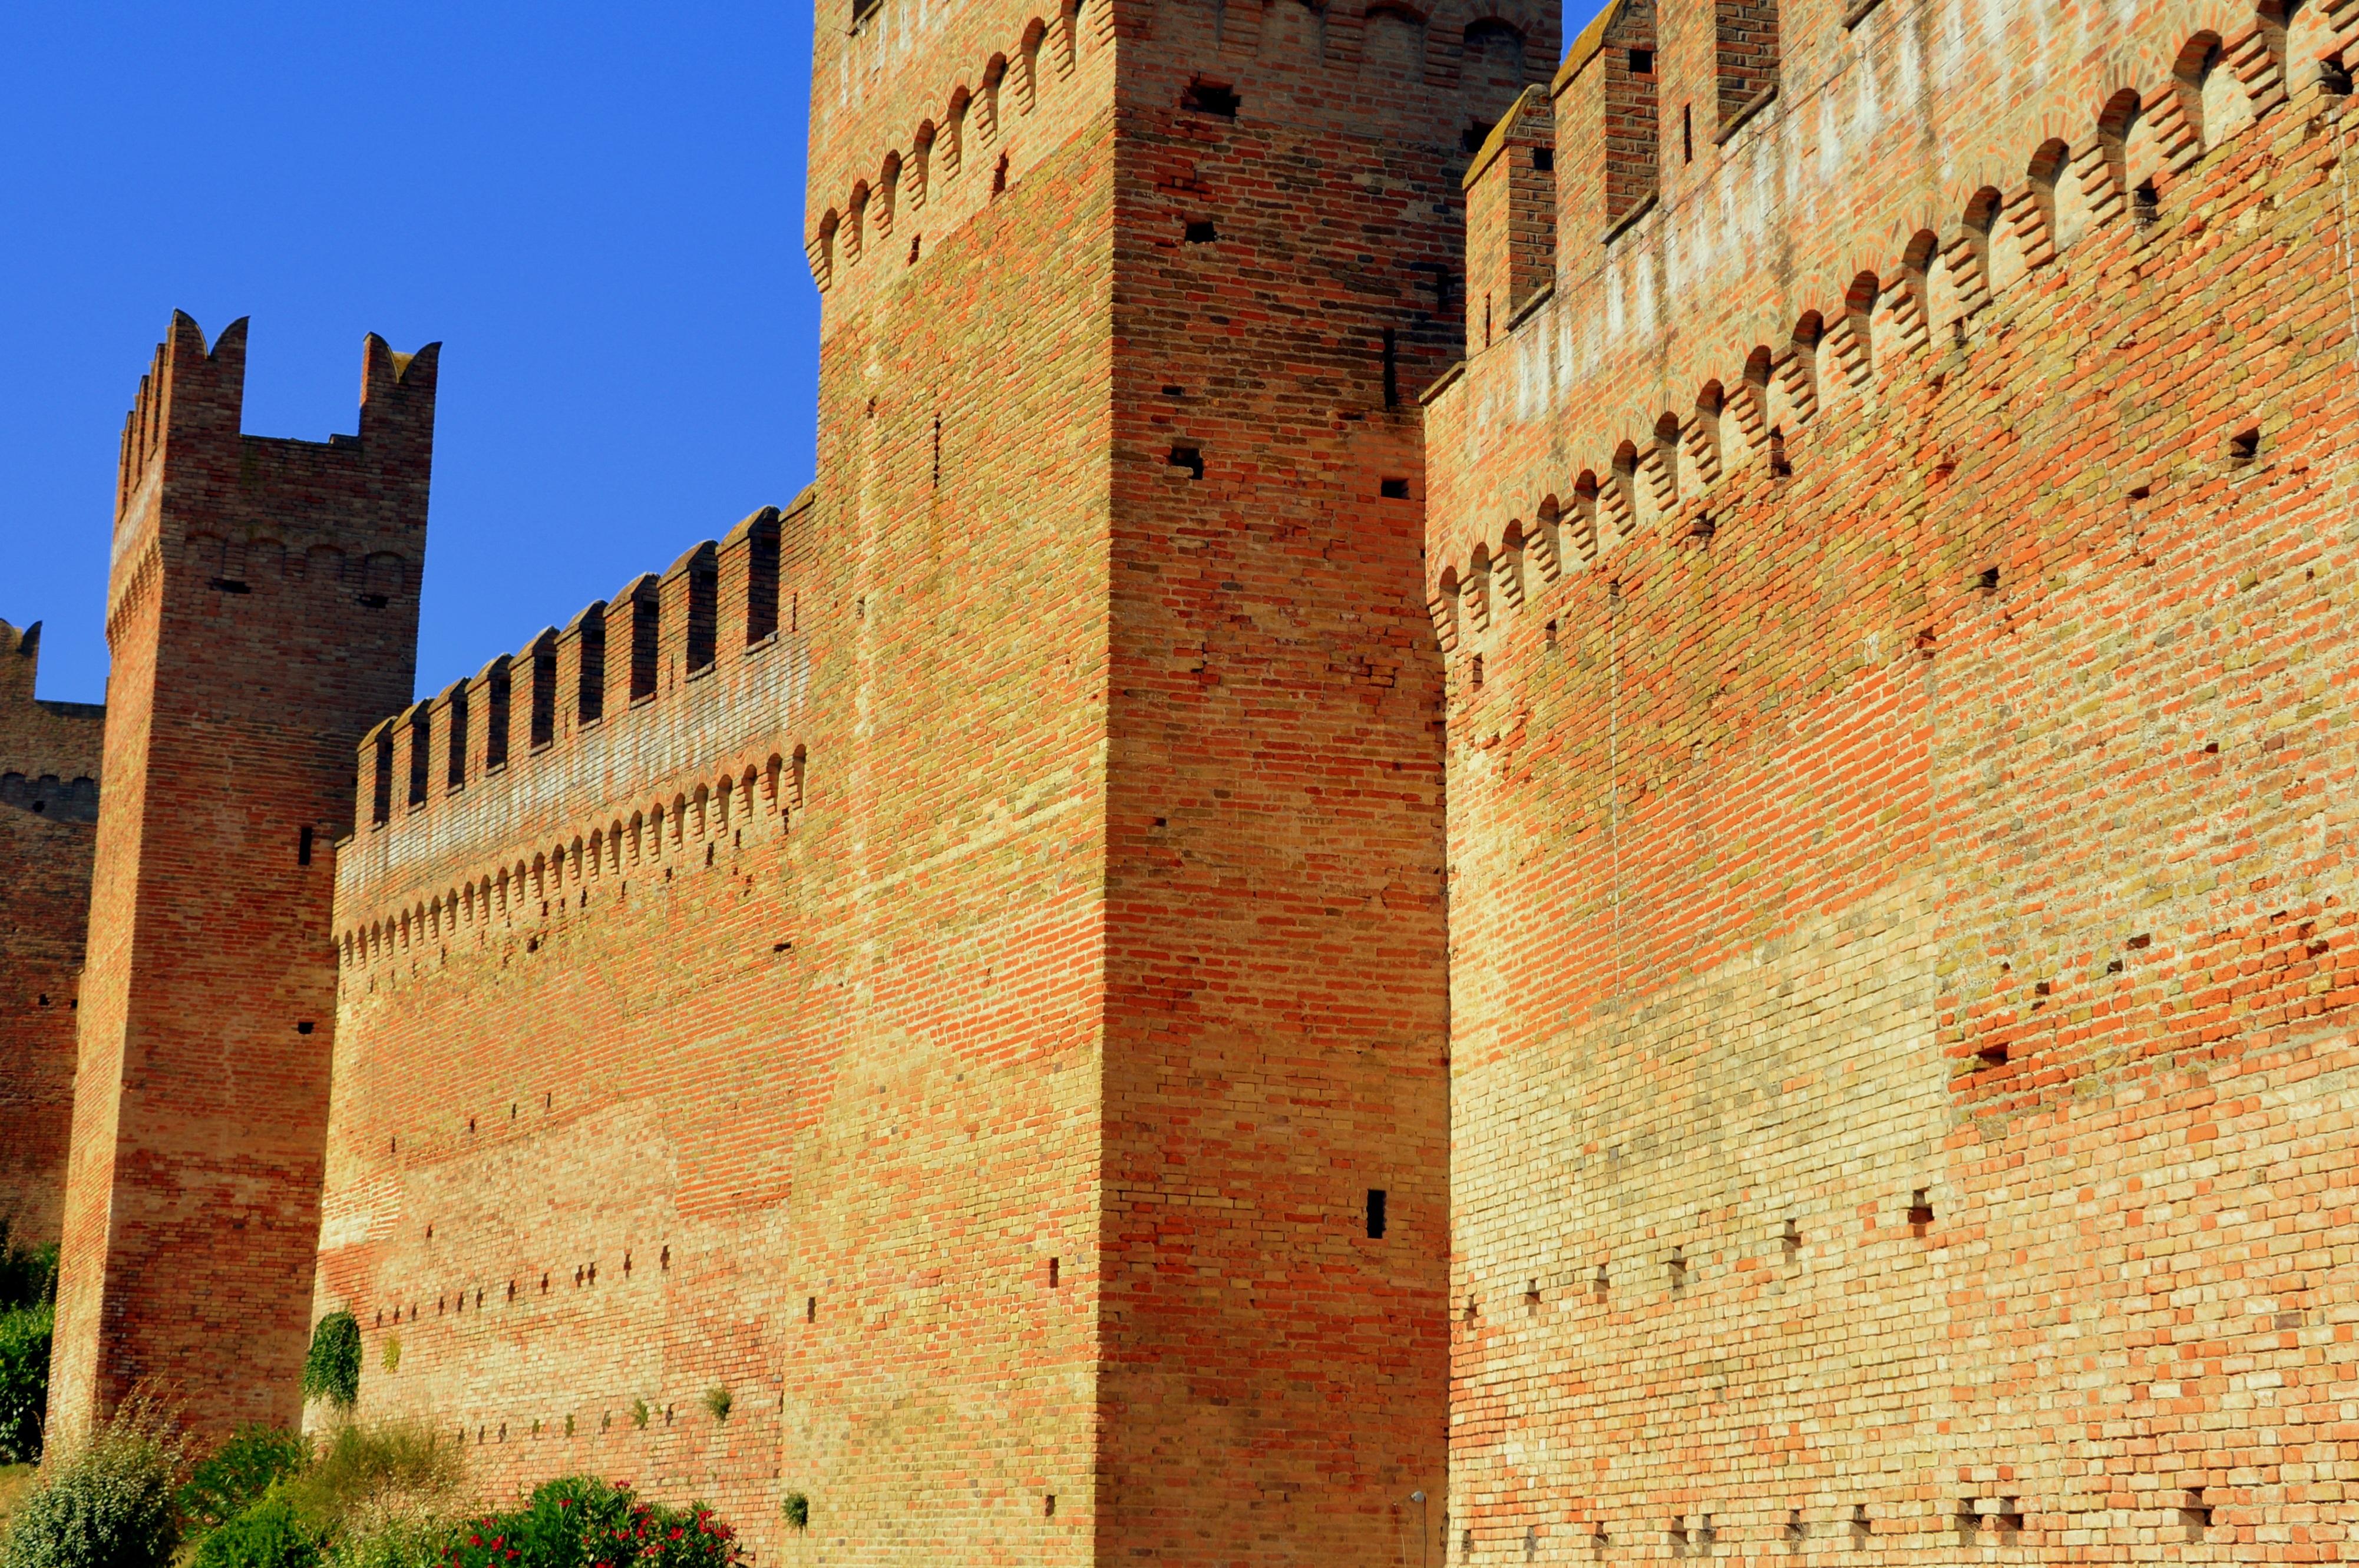 Castello di Gradara-Cinta muraria-Gradara-Pesaro-Urbino